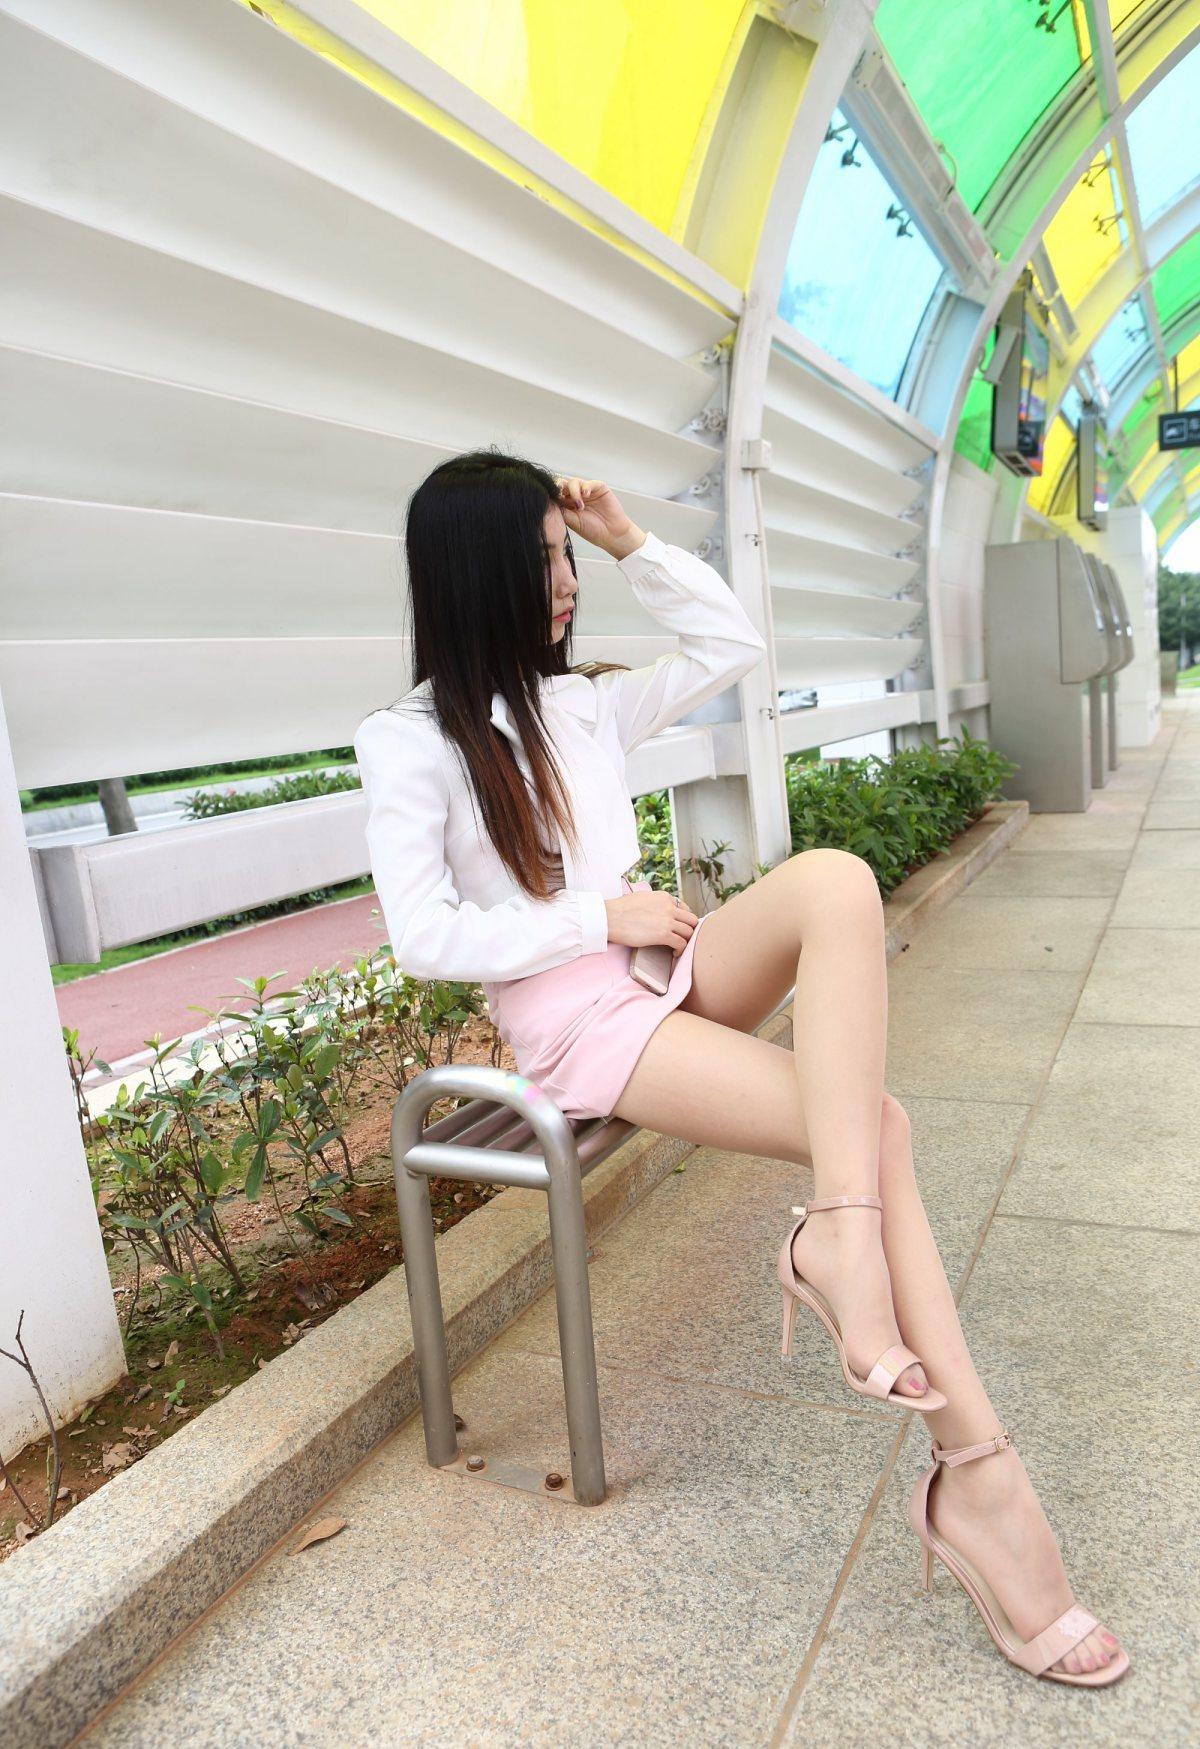 5IPZ-004酷似谭维维的日本大胸和服美女